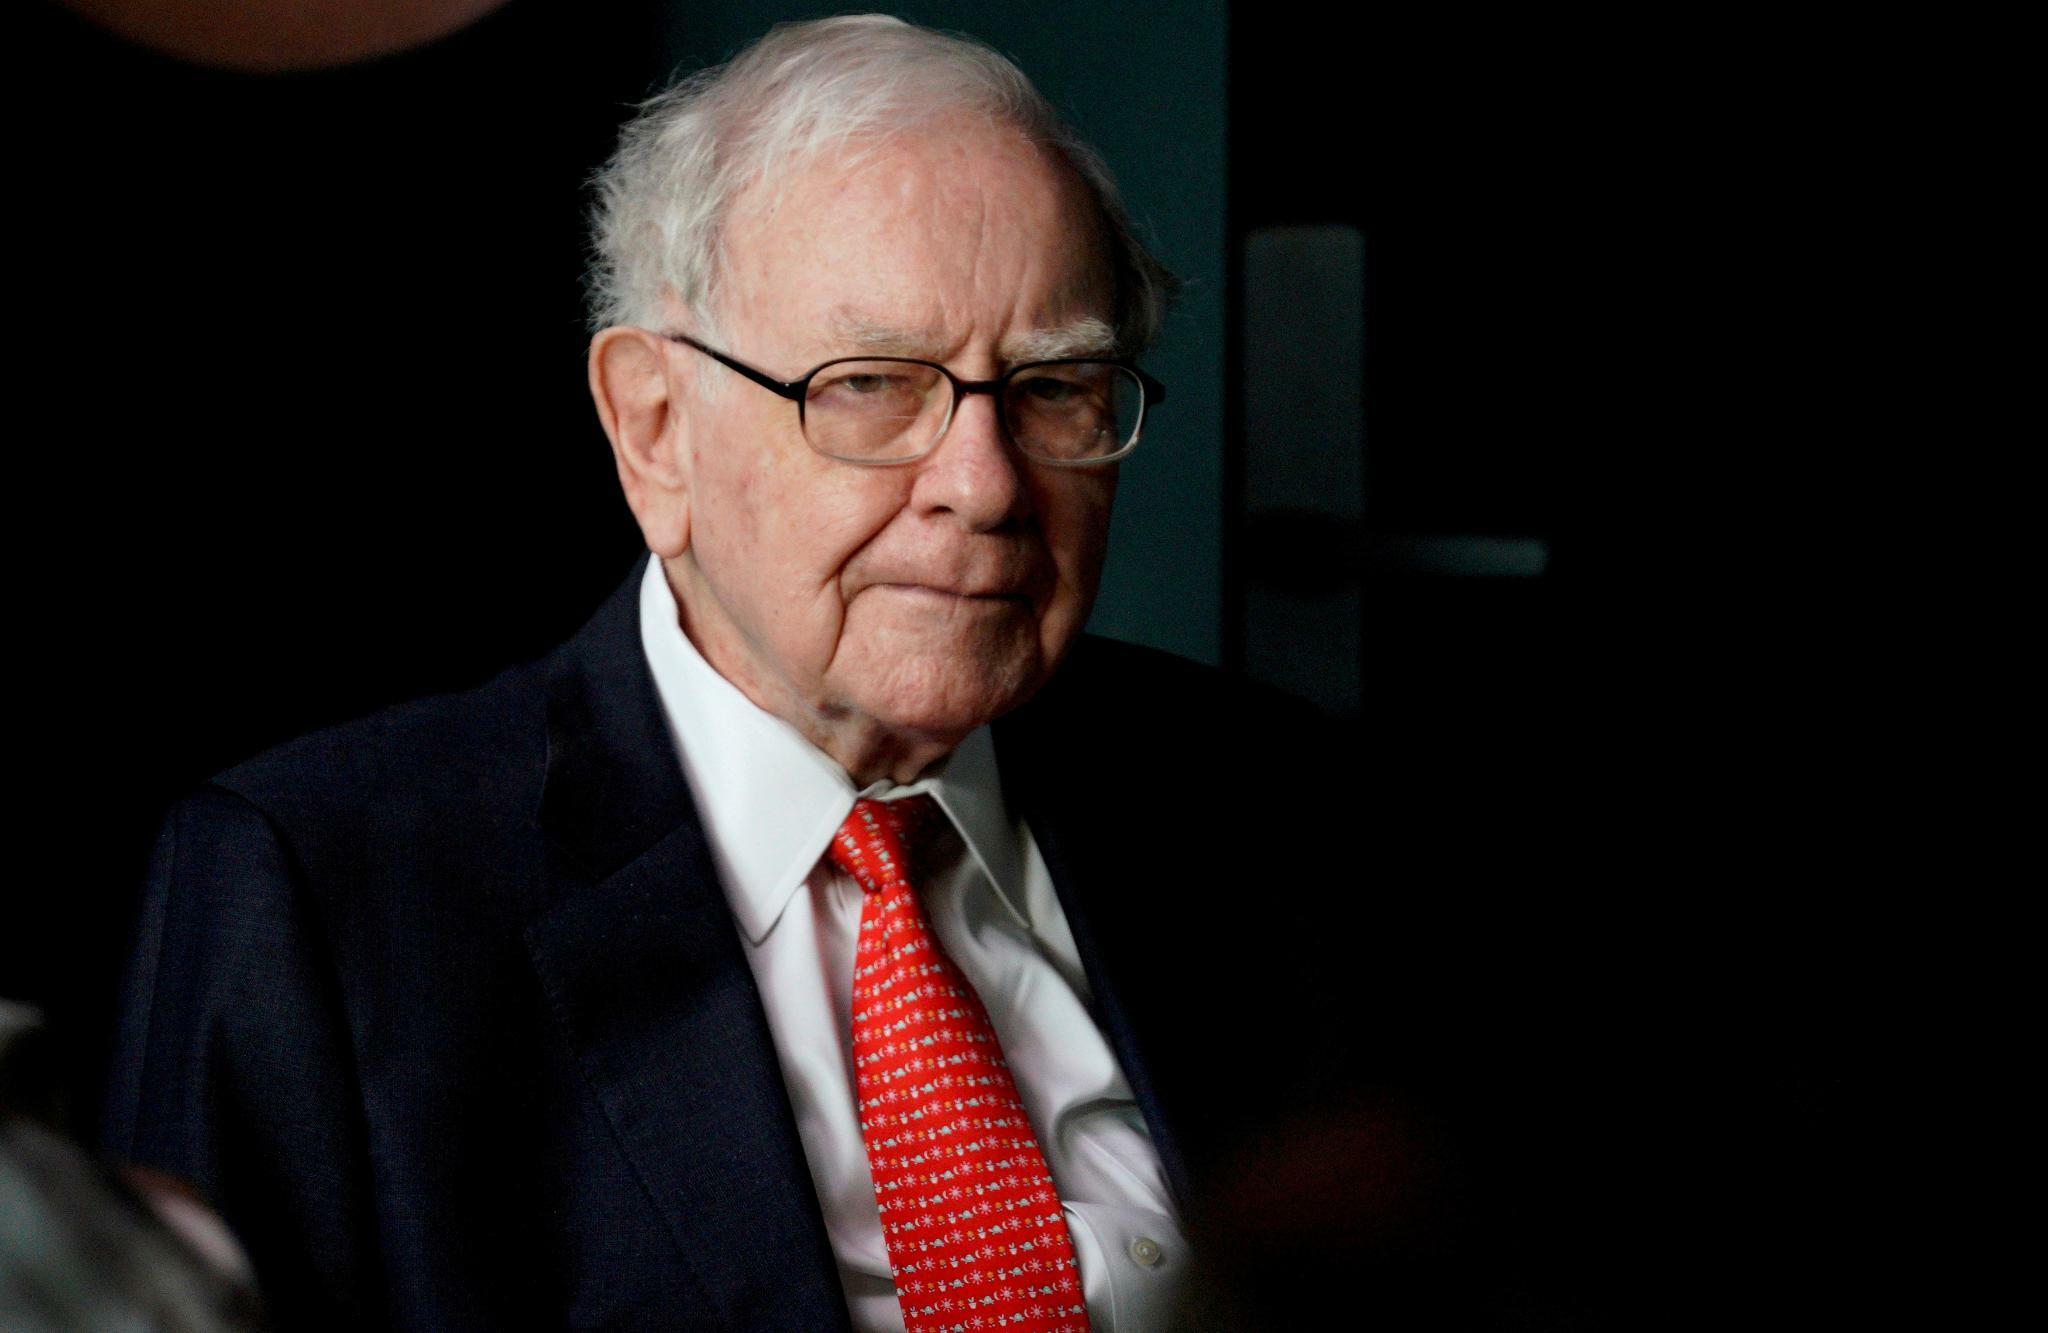 Kraft Heinz: Warren Buffett droht Abschreibung in Milliardenhöhe